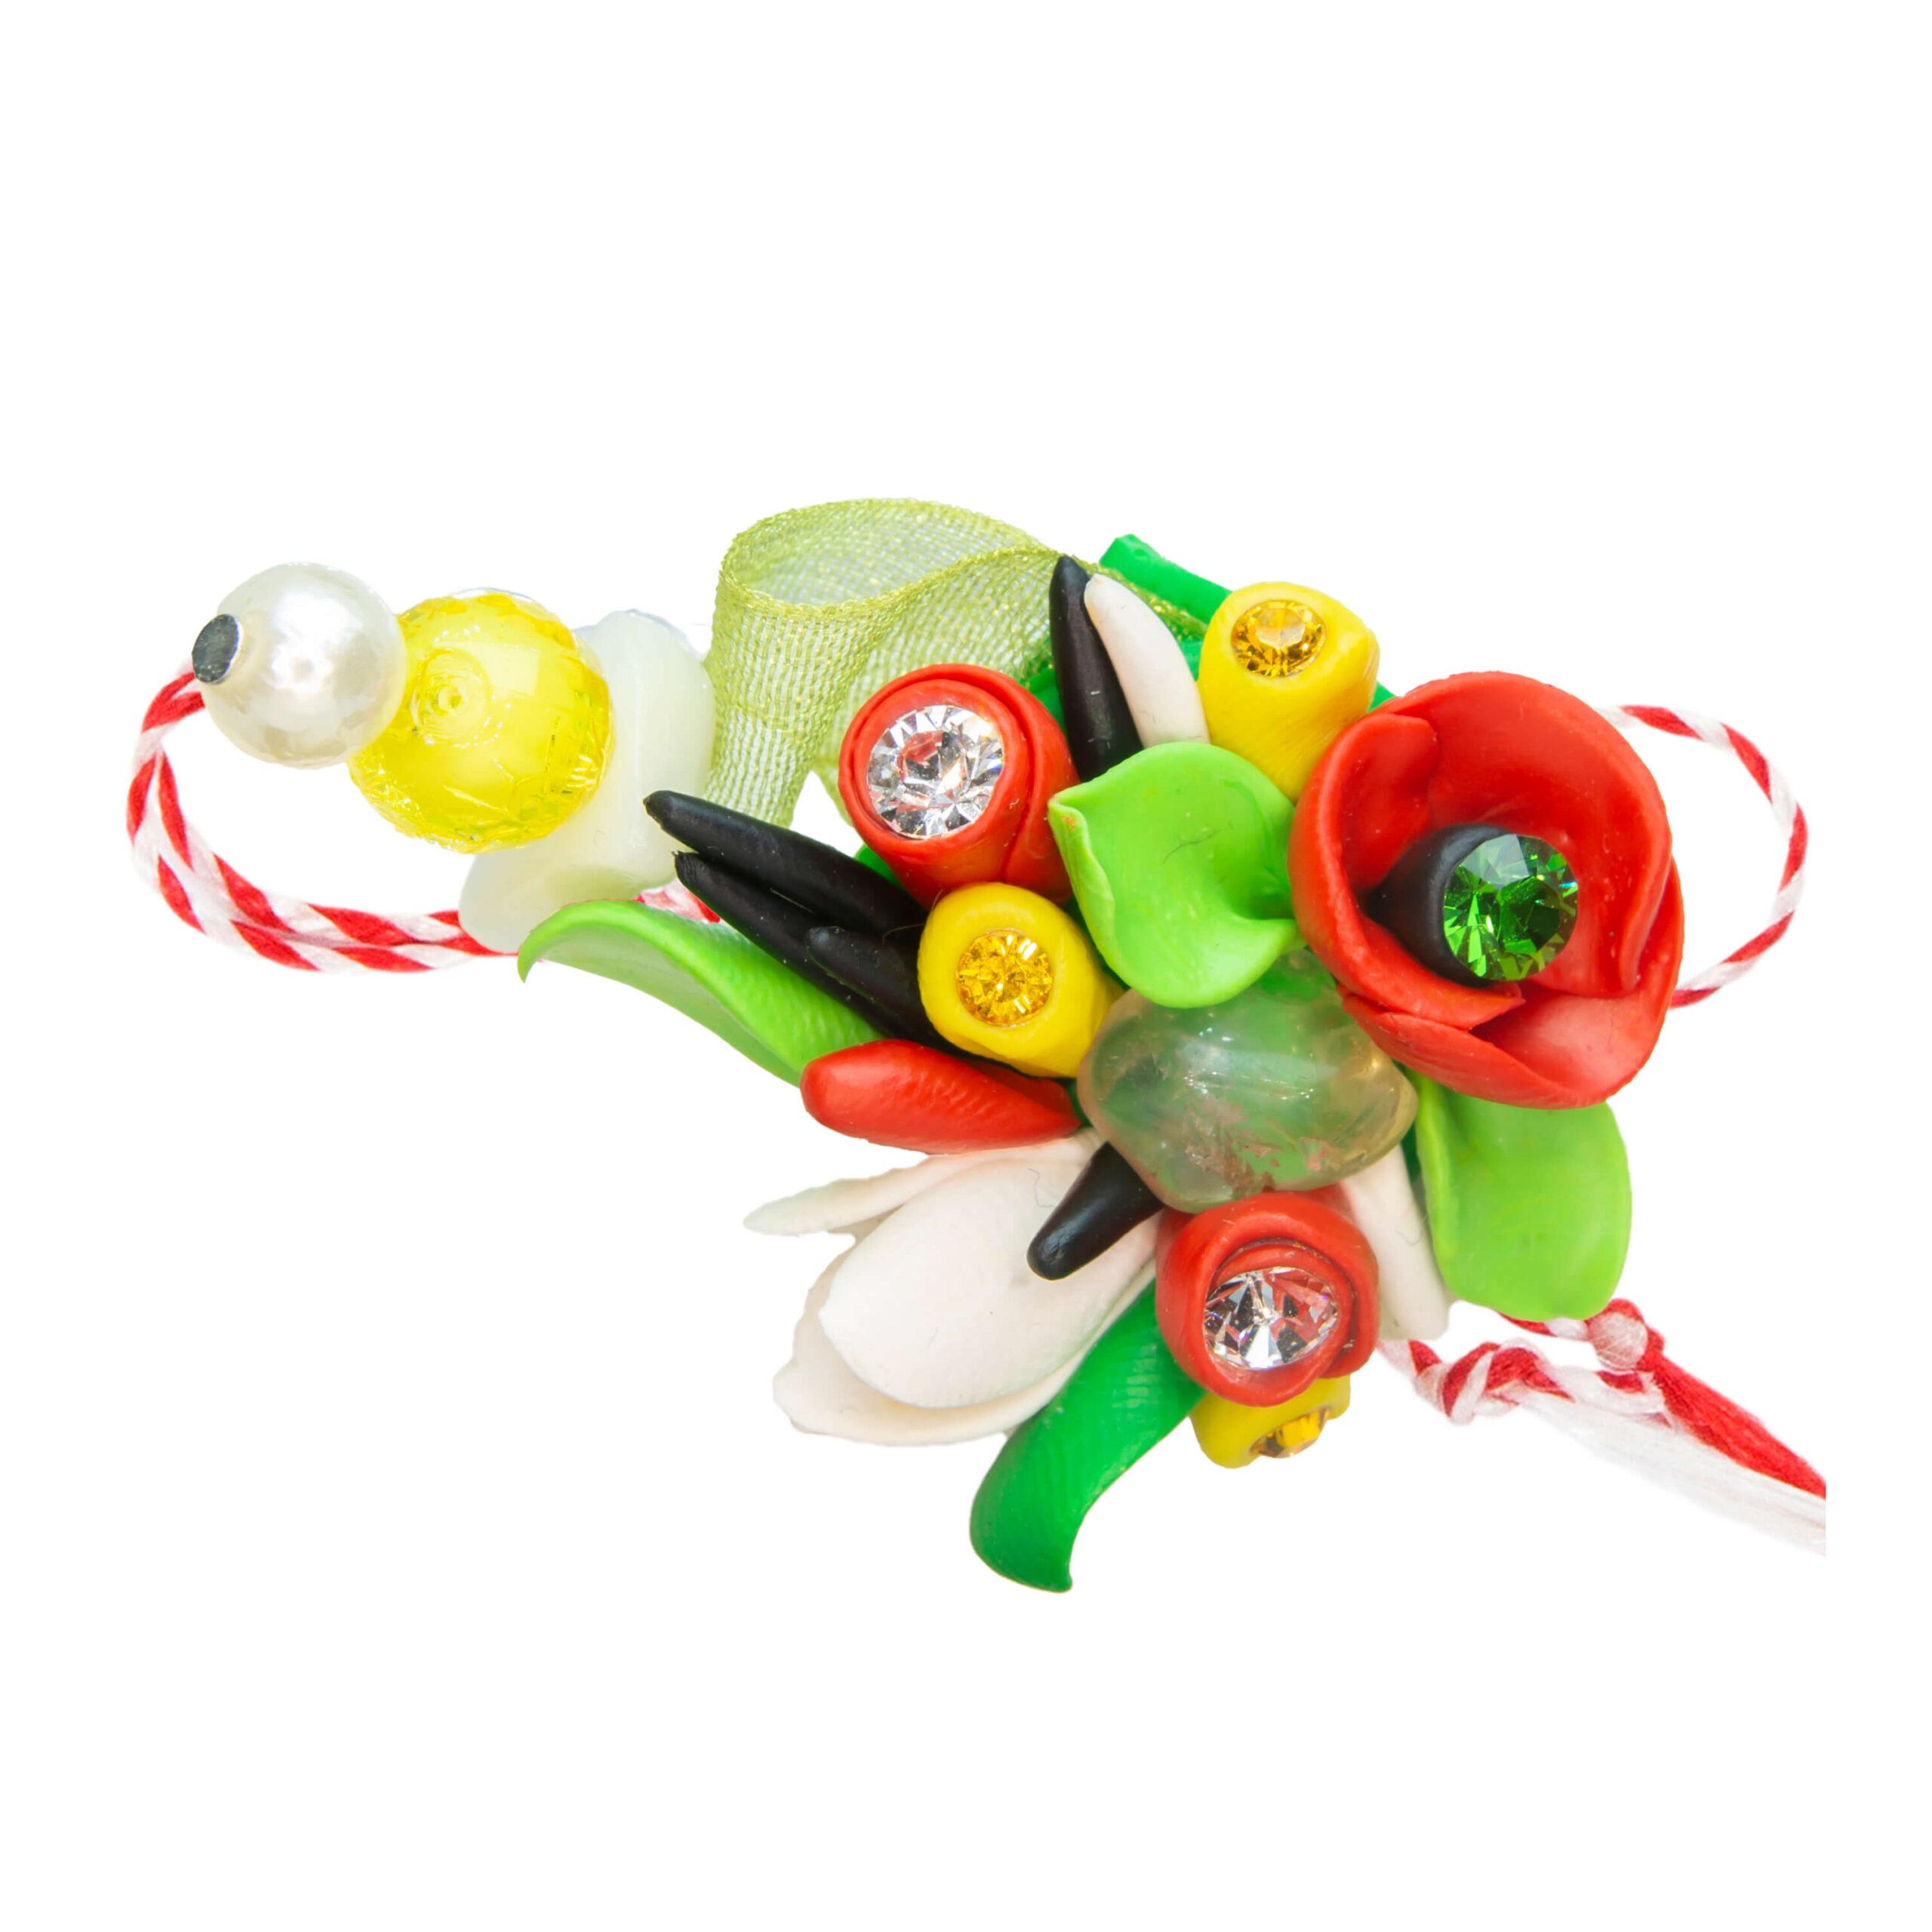 Martisor brosa buchet flori, Miidefloriart, model 58